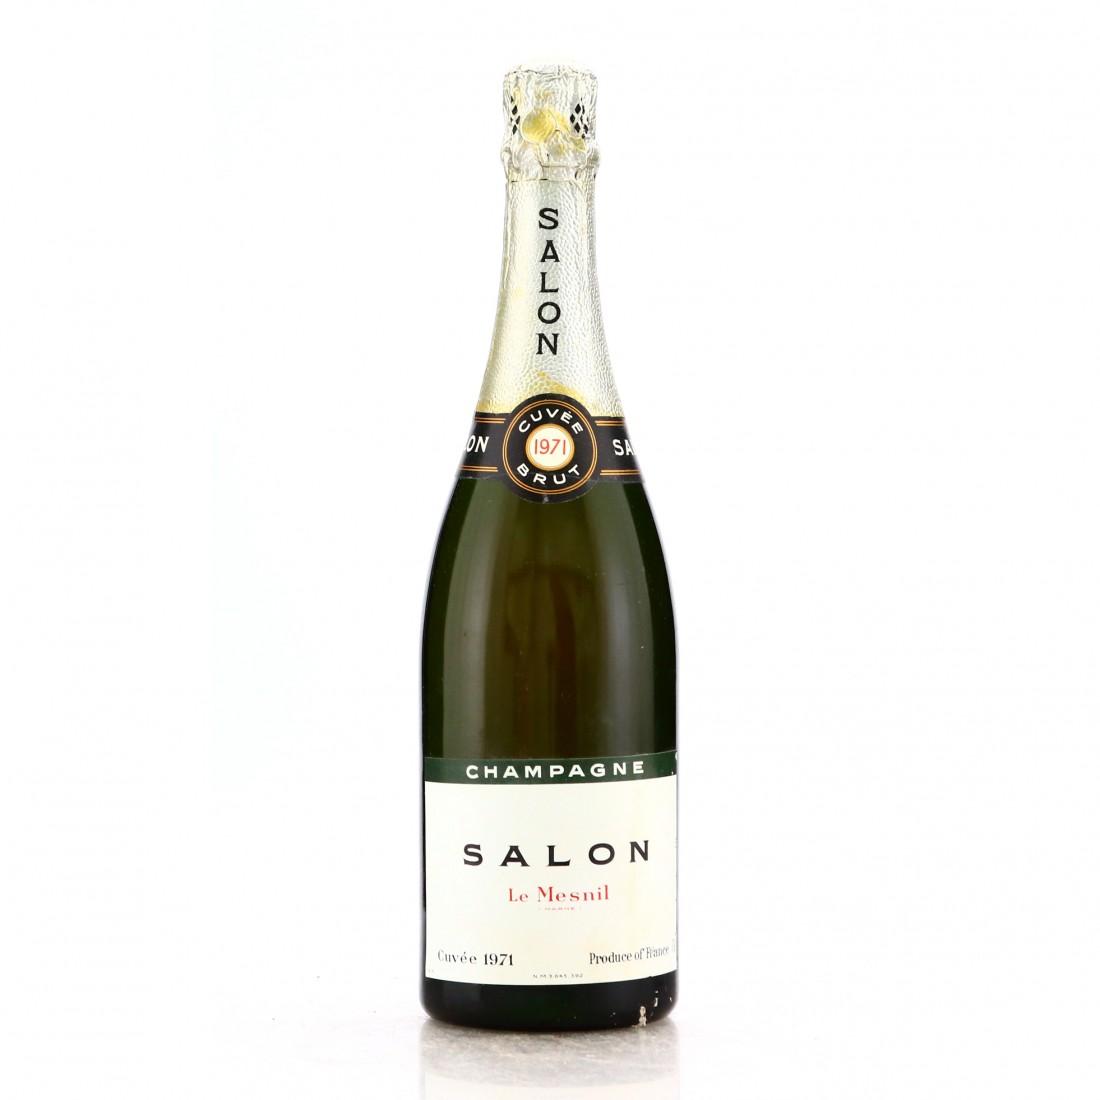 Salon Le Mesnil Brut 1971 Vintage Champagne